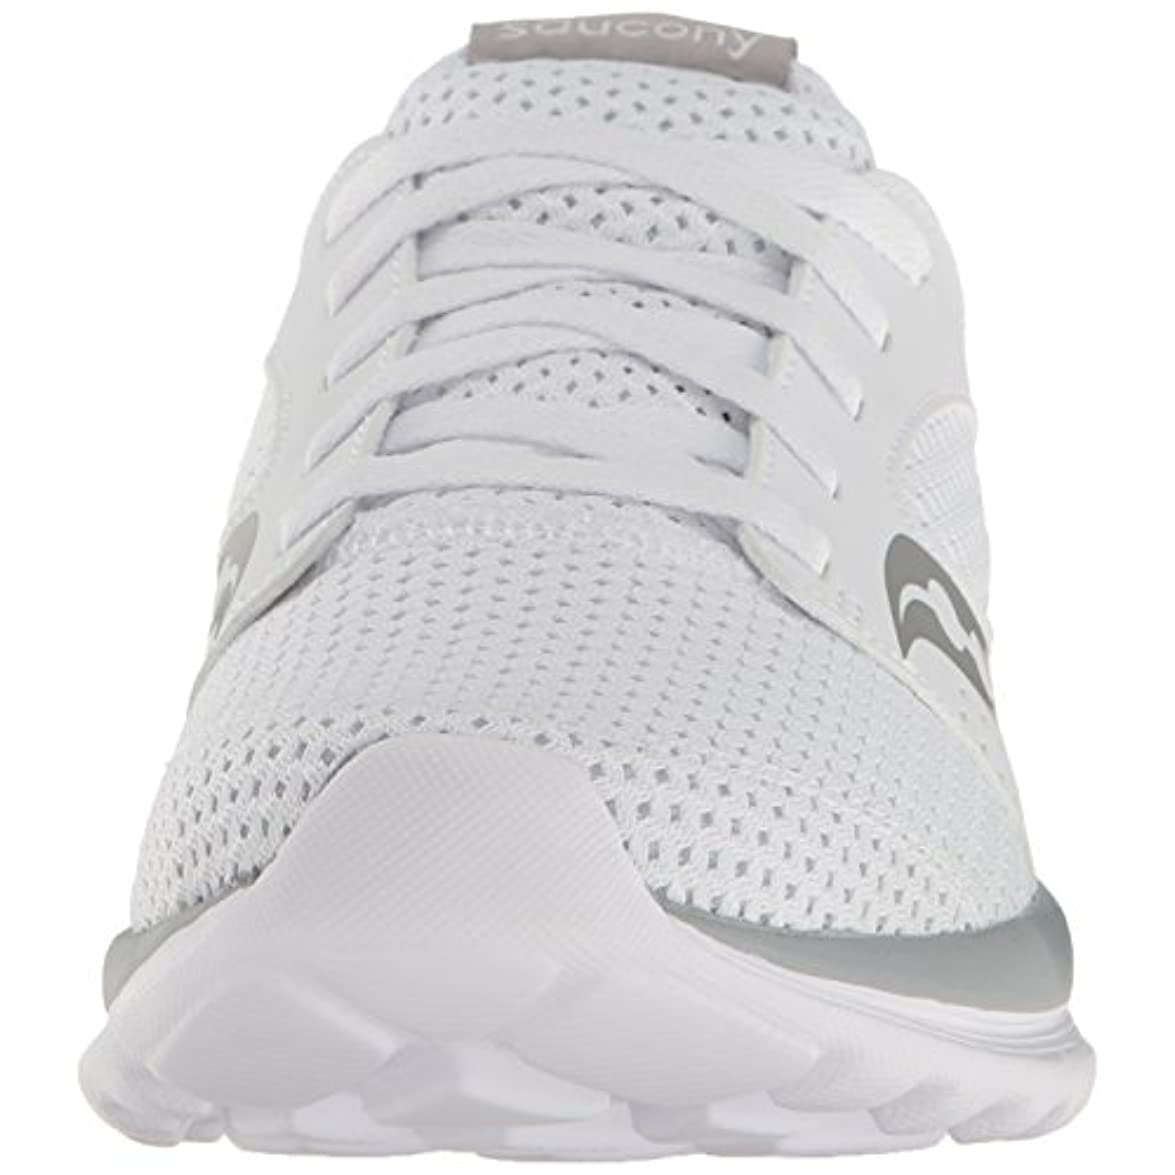 Saucony Women's Kineta Relay Road Running Shoe Coral mint 10 M Us